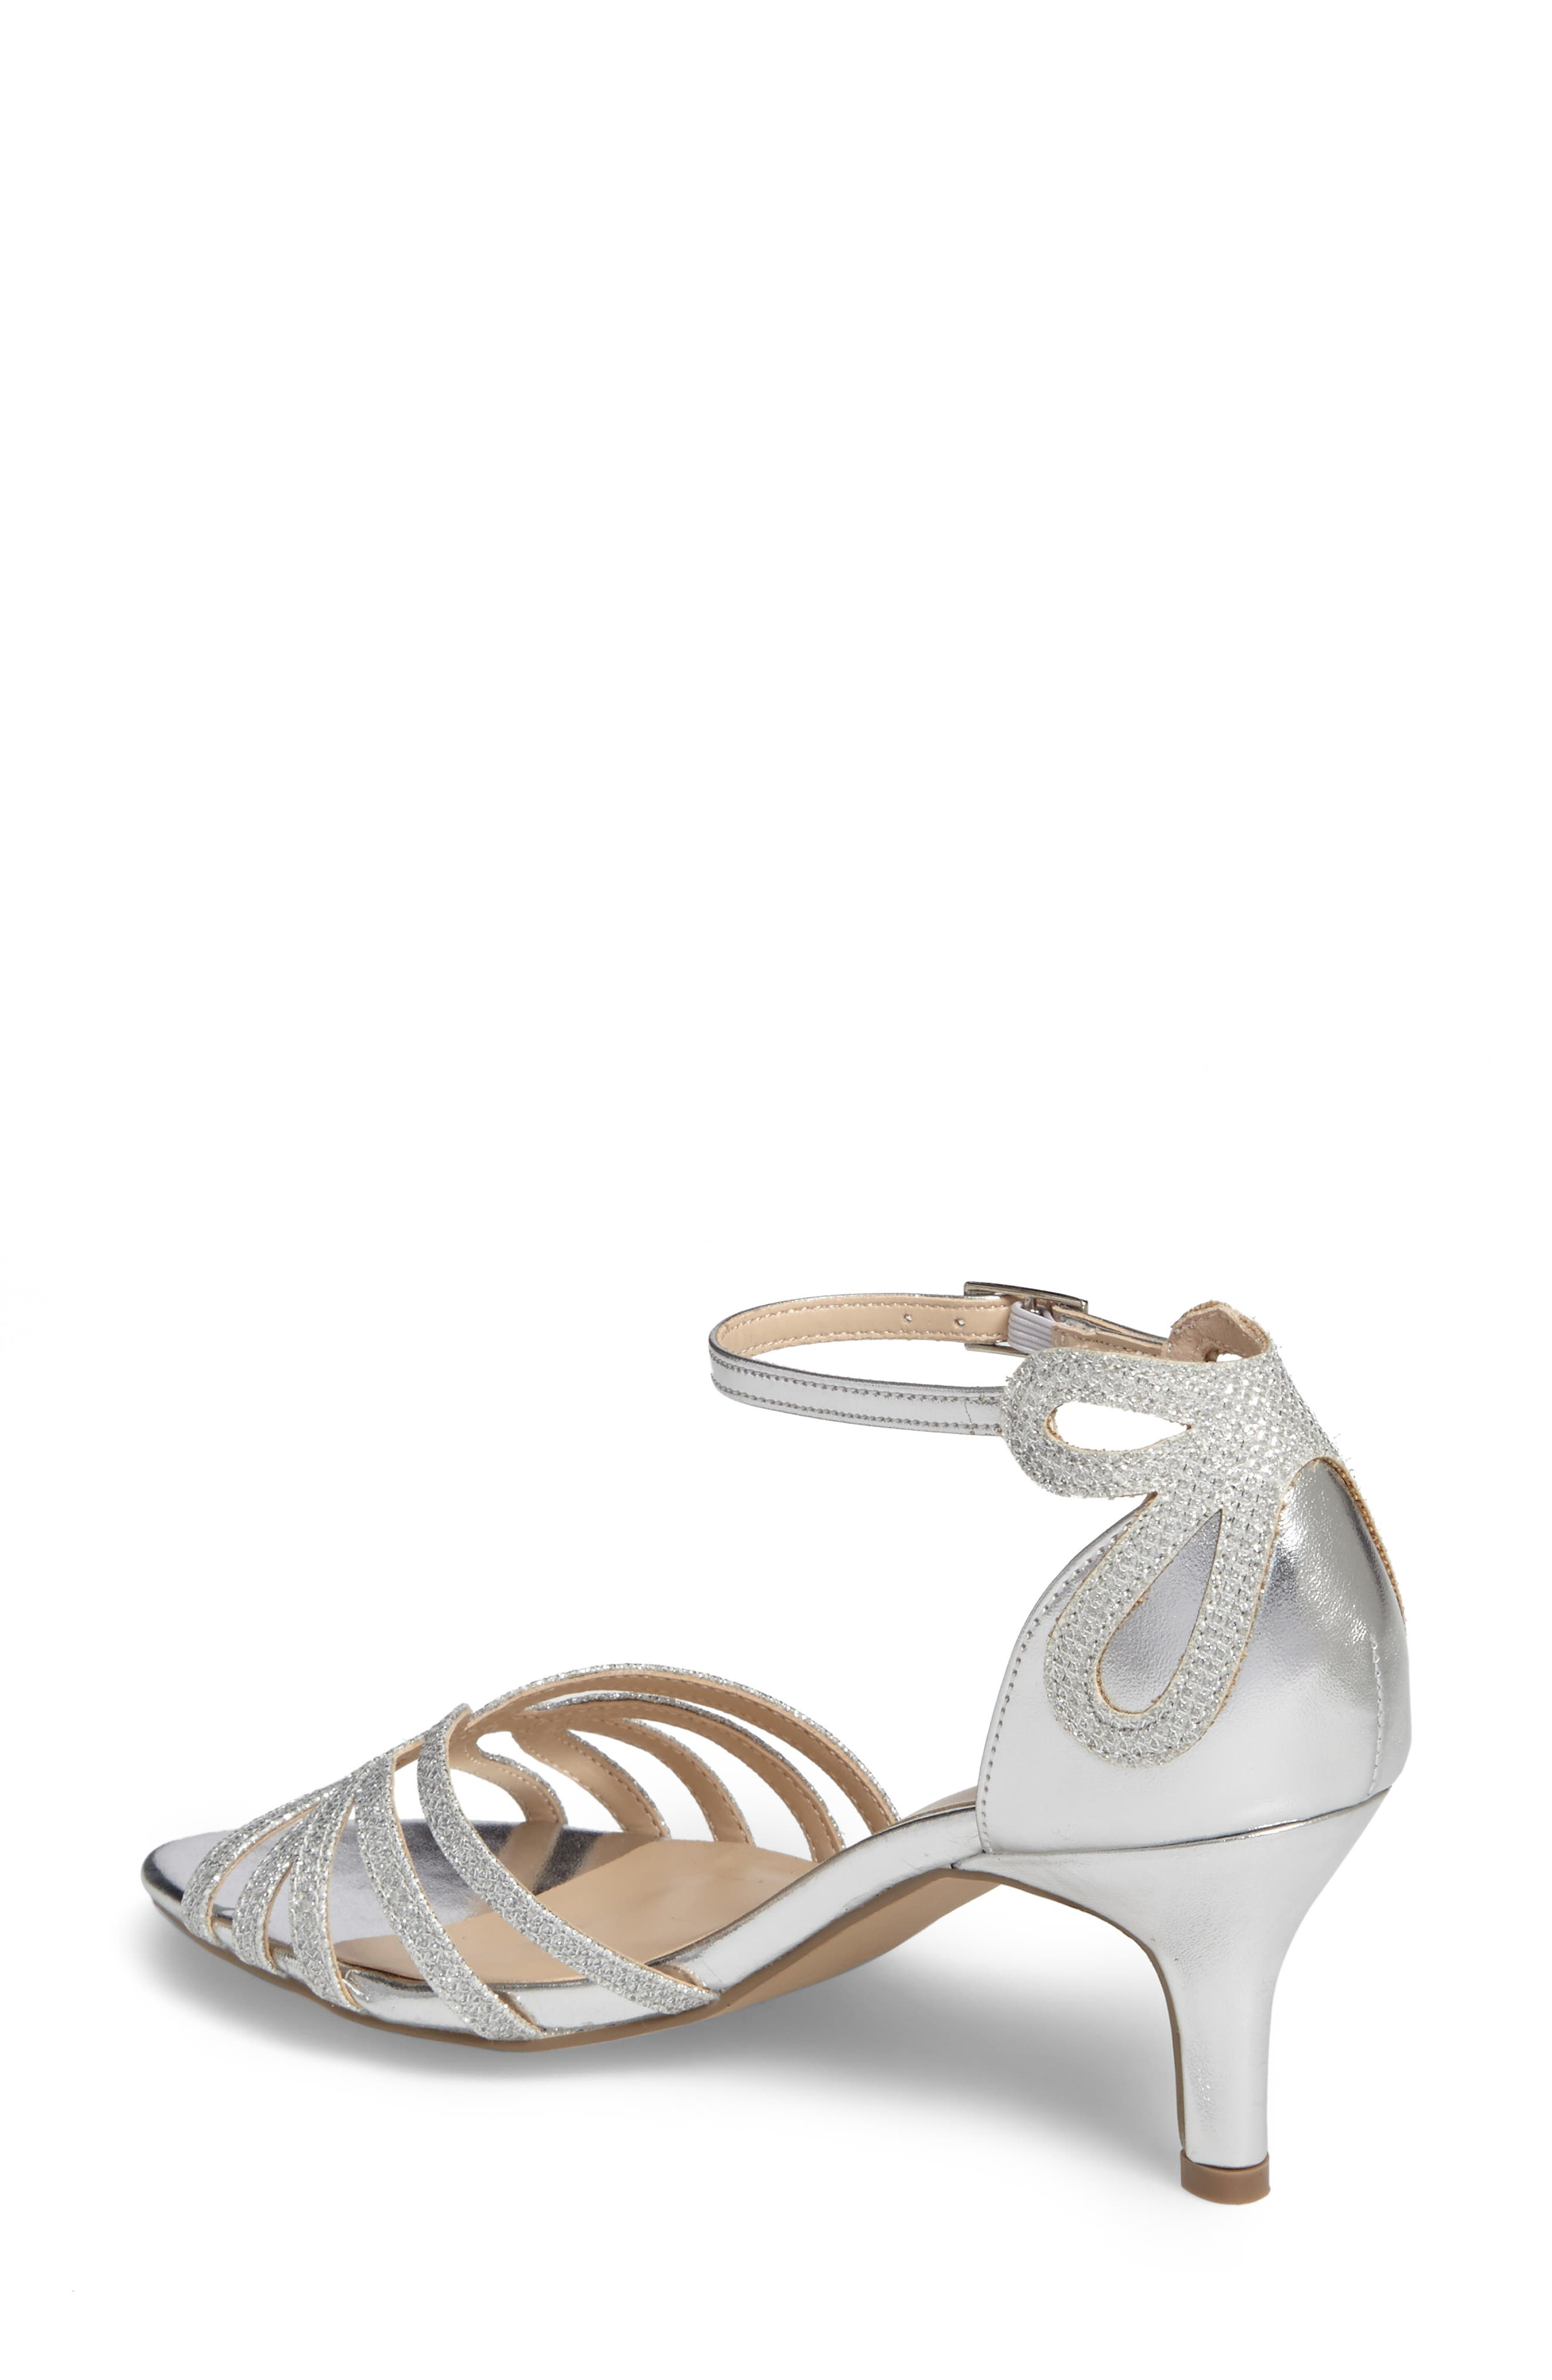 Melby Ankle Strap Sandal,                             Alternate thumbnail 2, color,                             SILVER